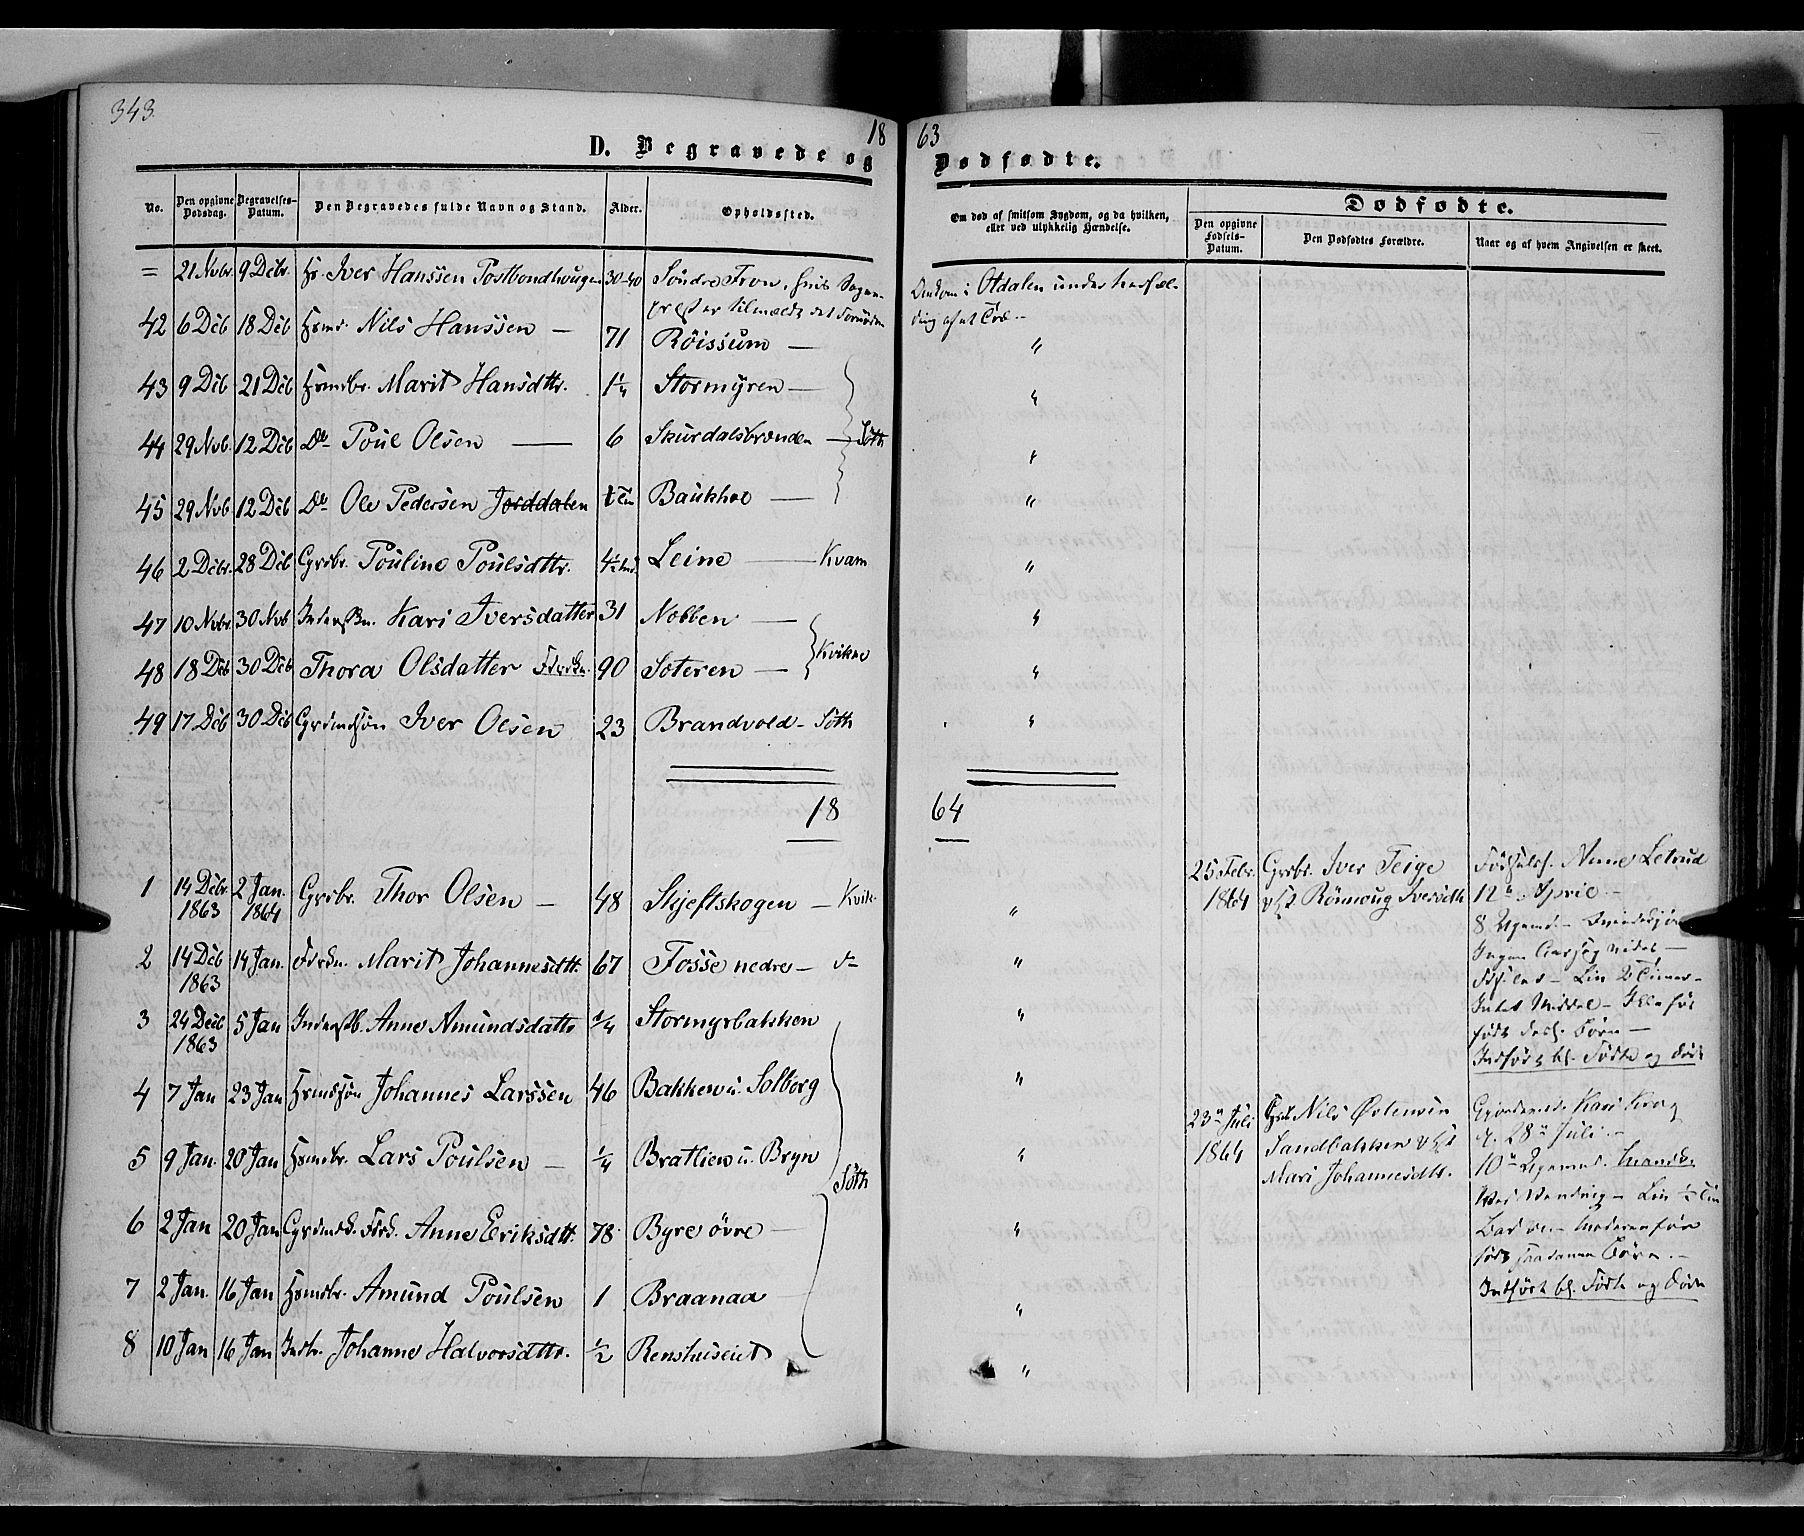 SAH, Nord-Fron prestekontor, Ministerialbok nr. 1, 1851-1864, s. 343